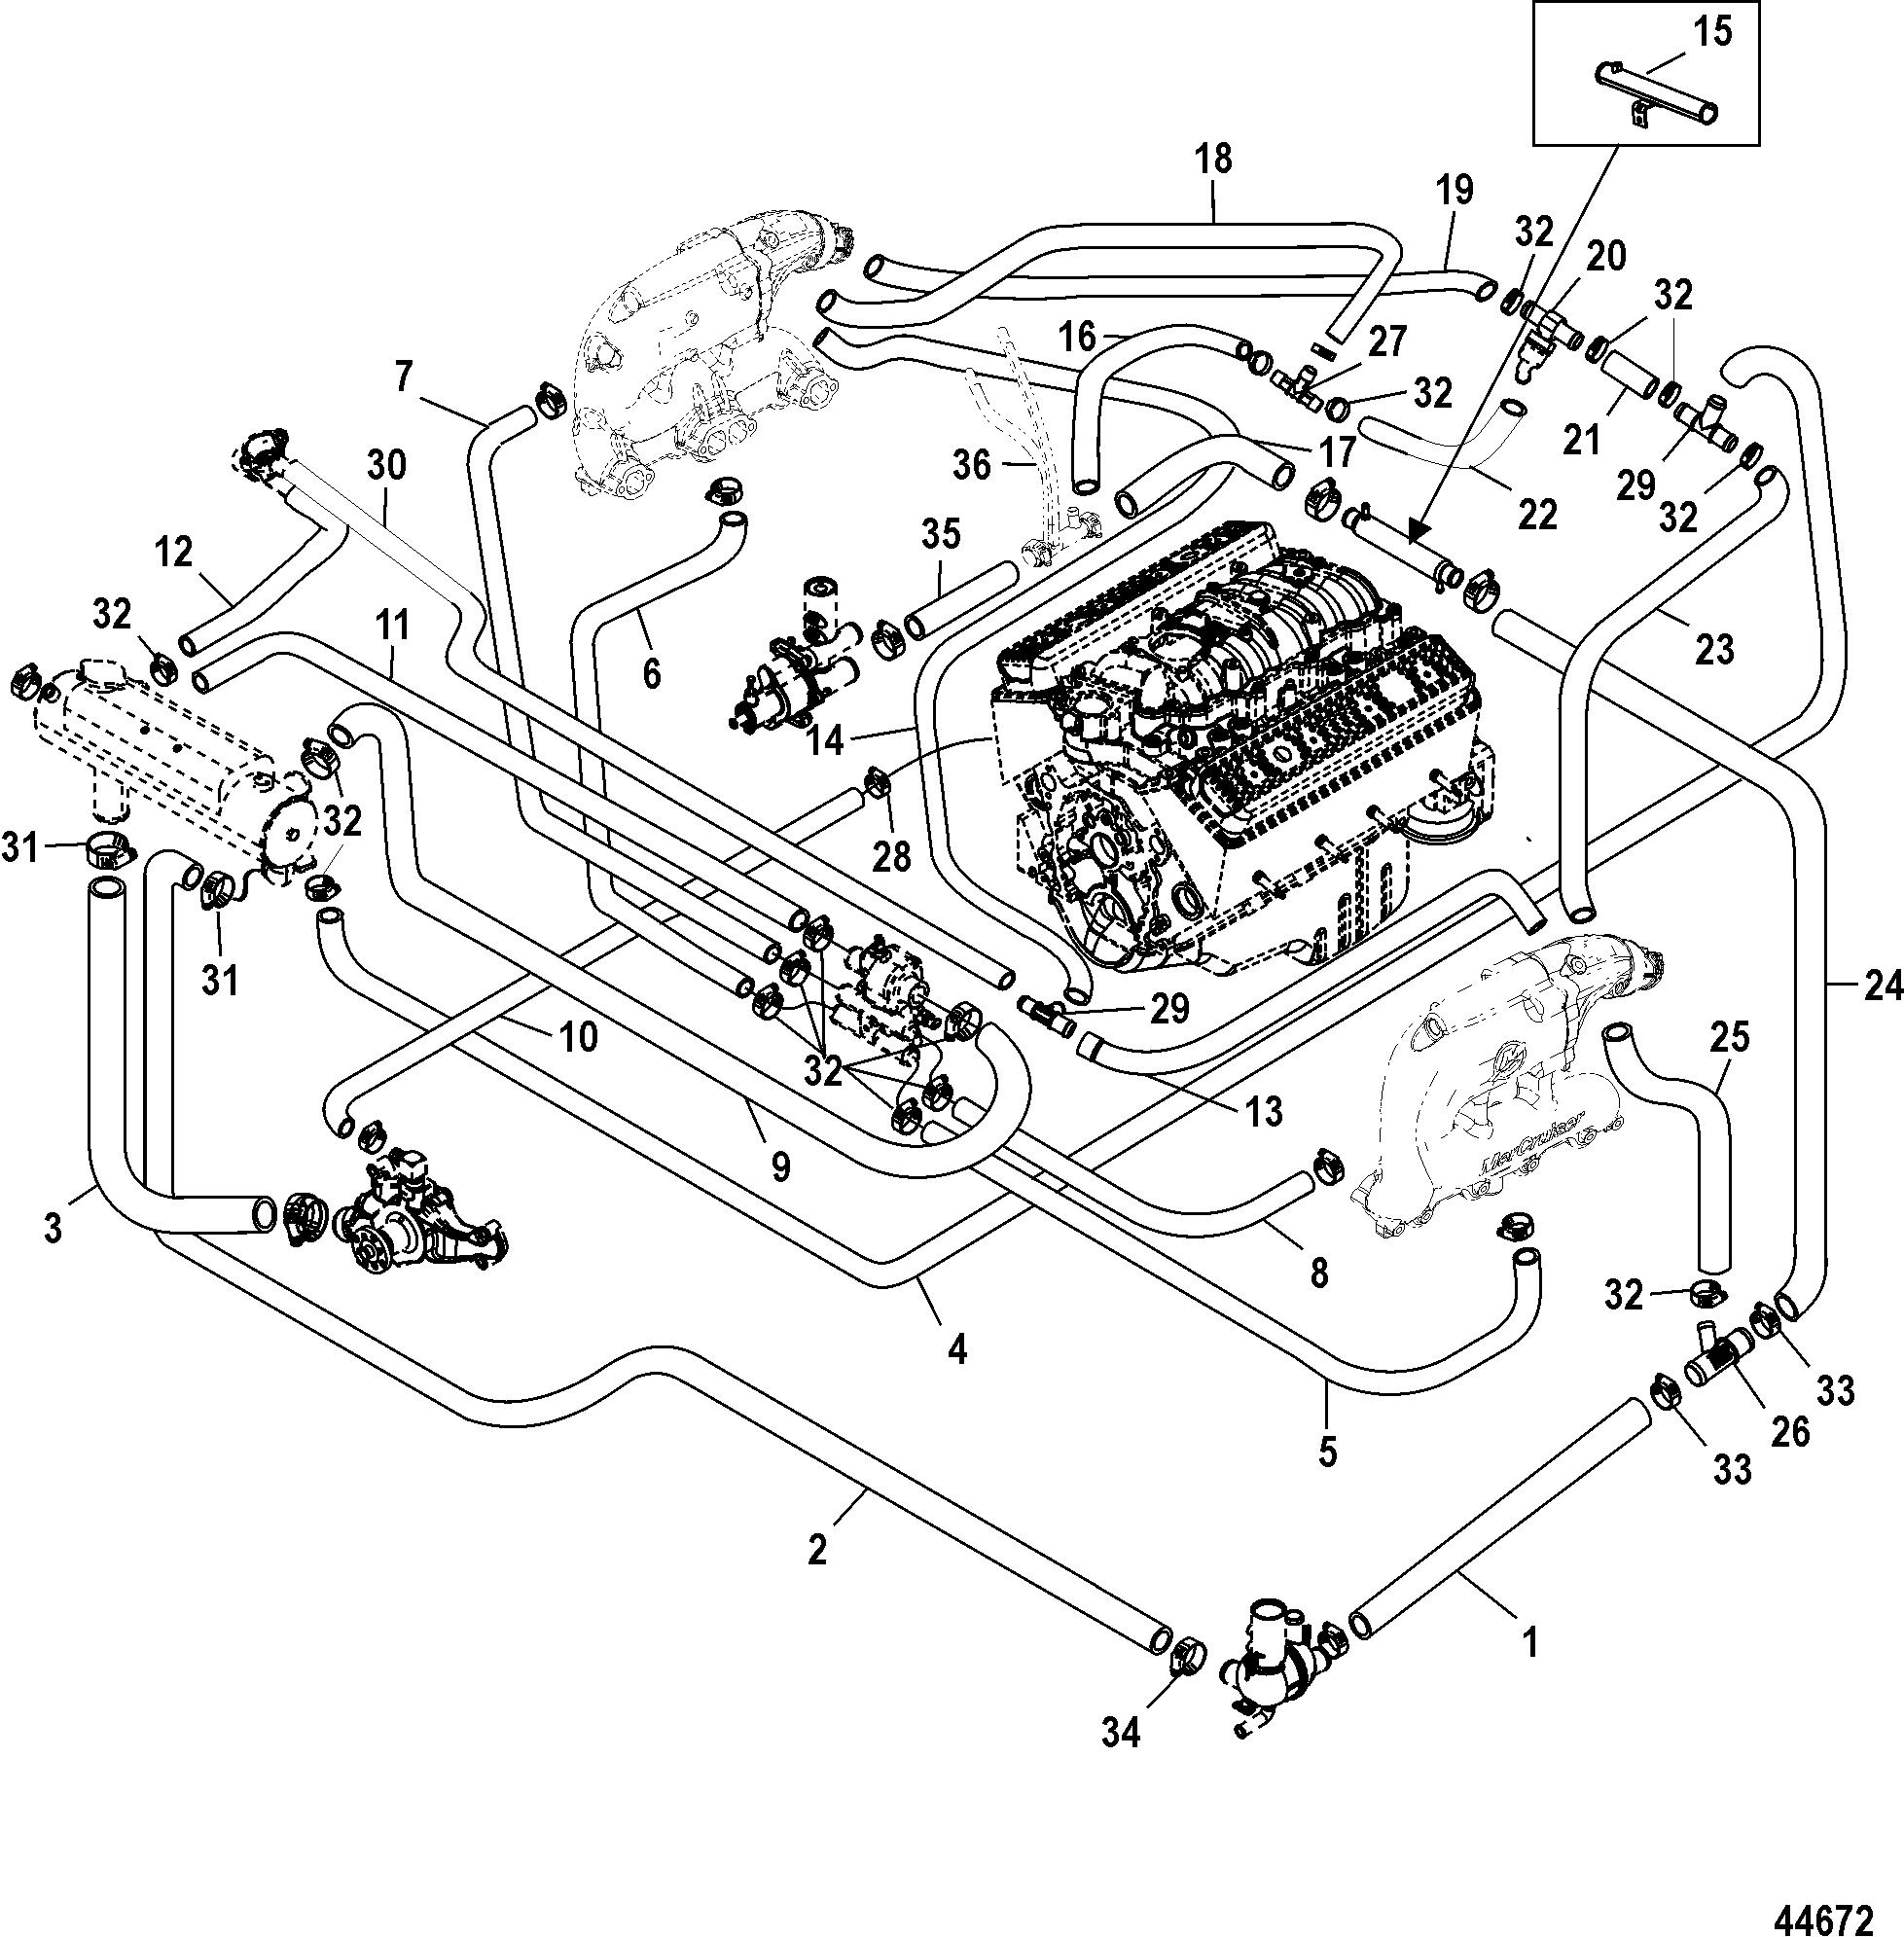 44672 hardin marine closed cooling system (bravo)